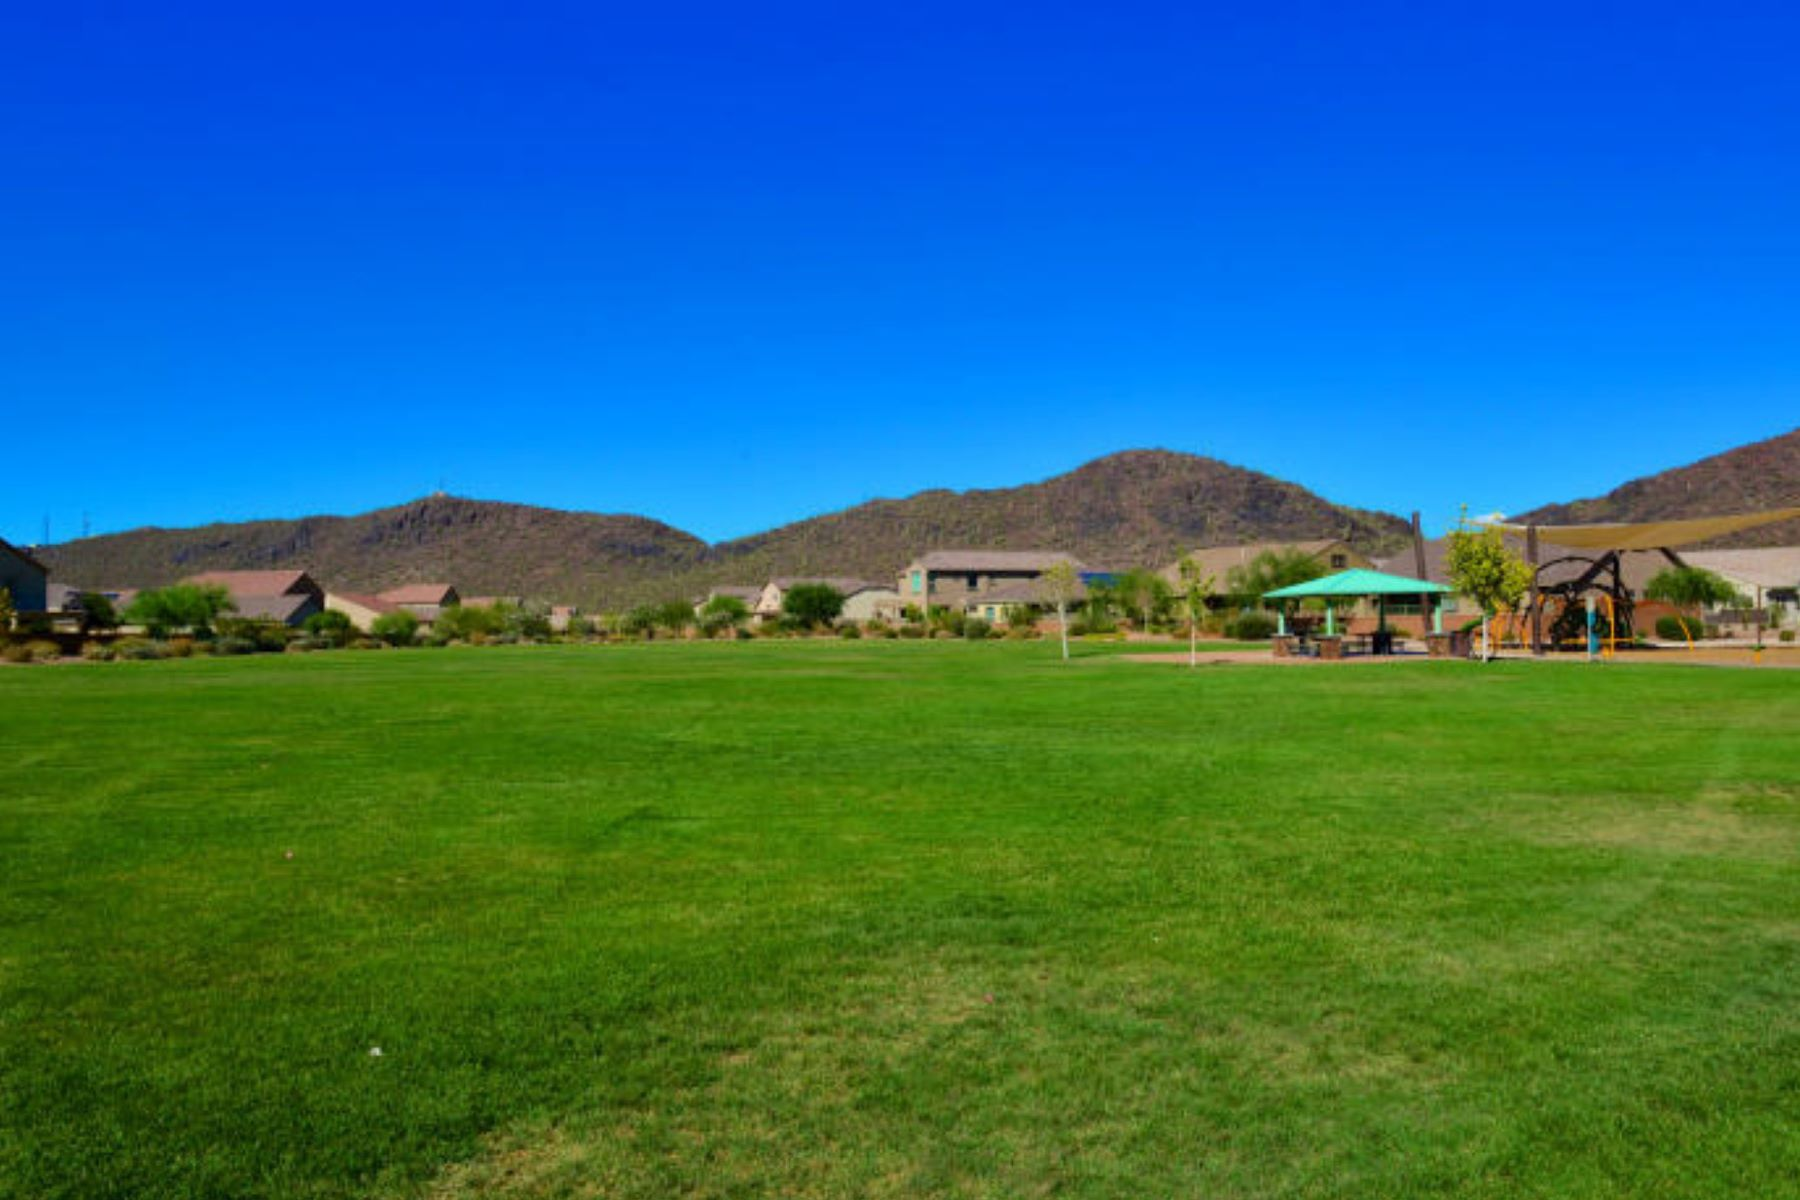 独户住宅 为 销售 在 Energy Star Qualified Home 8710 W Denstone Road 图森, 亚利桑那州, 85743 美国